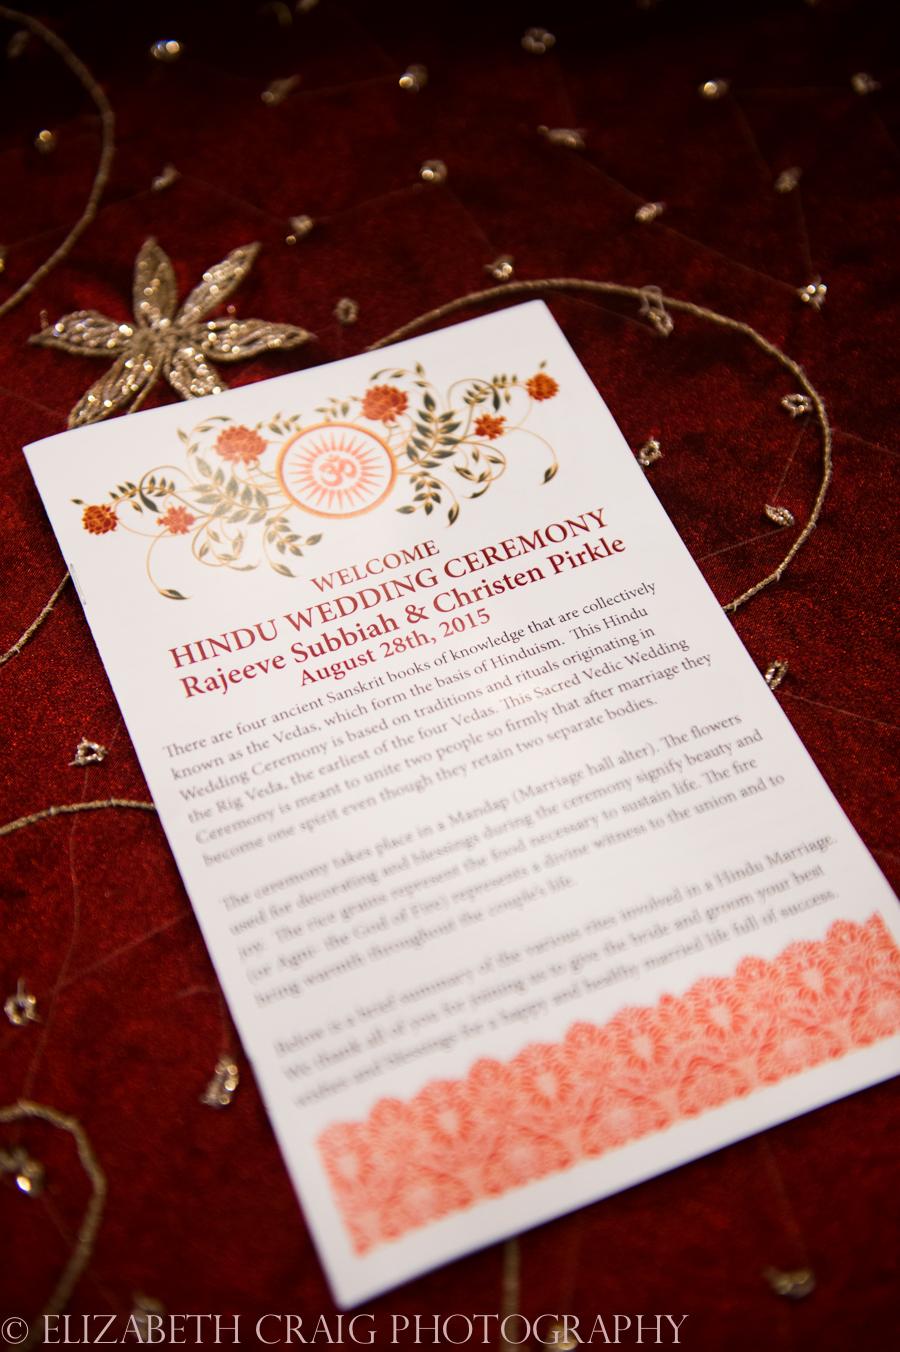 Monroeville Jain Temple Indian Weddings-4